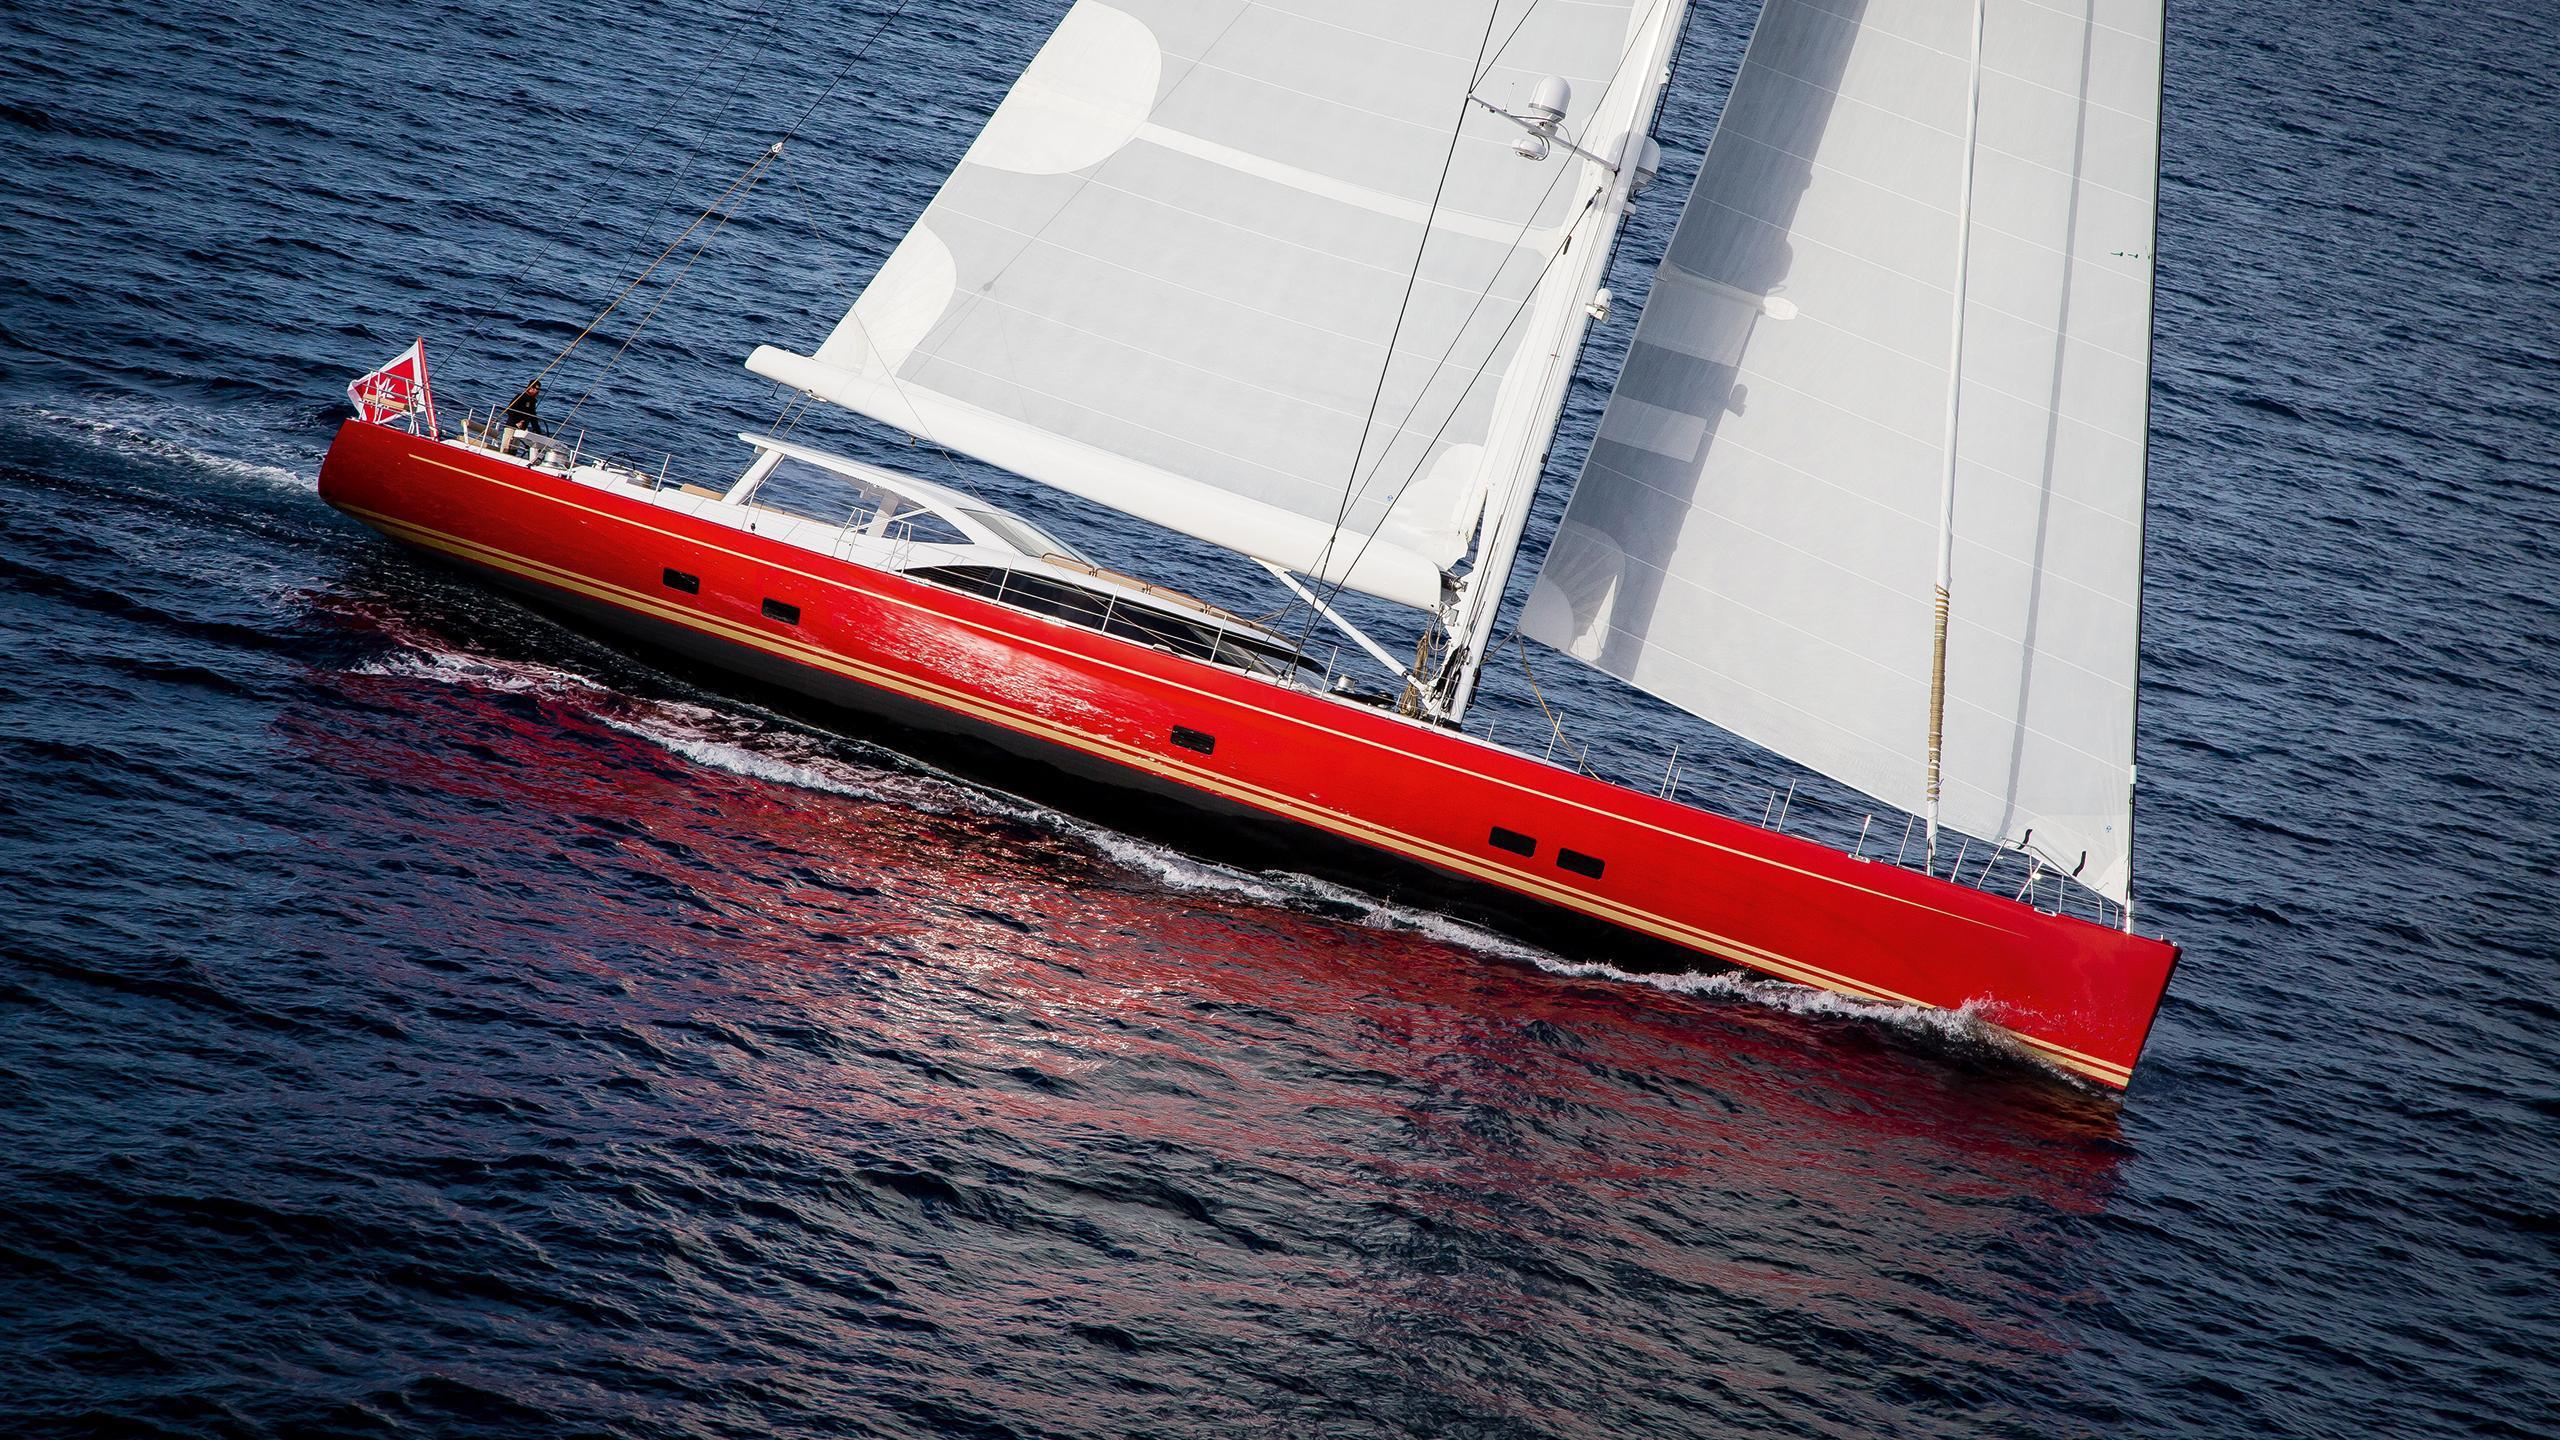 doryan-sailing-yacht-2015-35m-cruising